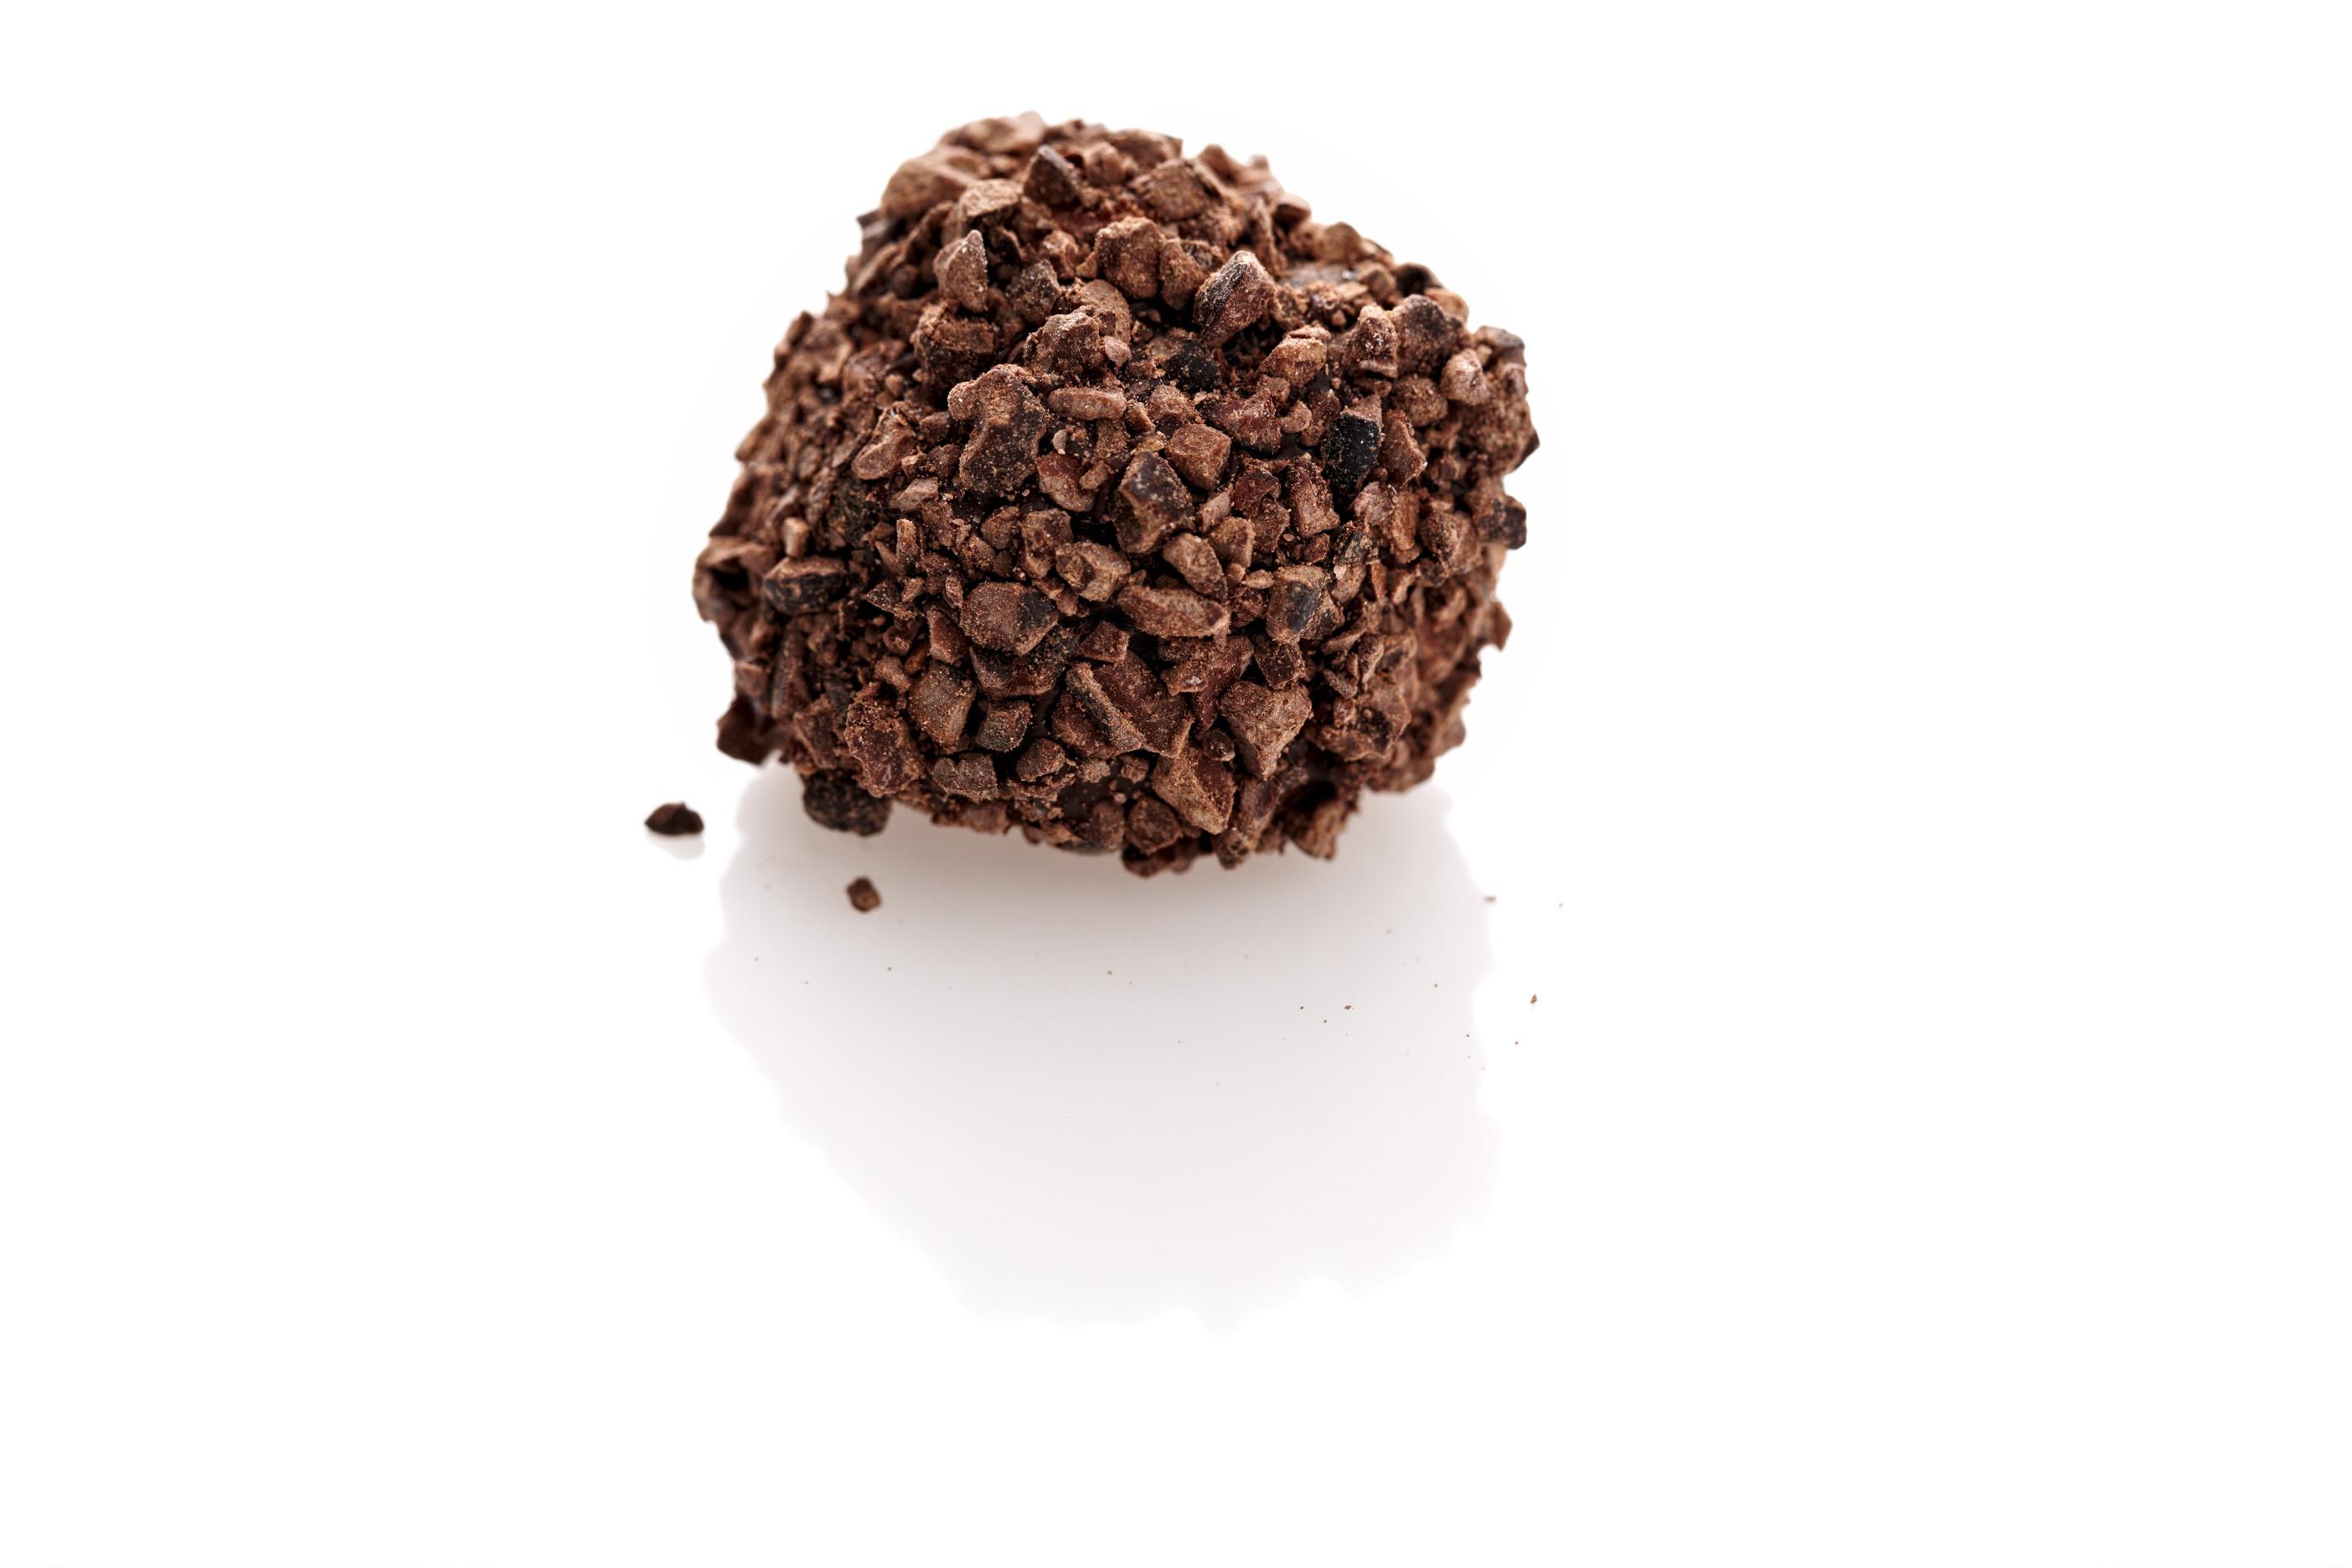 caramel-fleur-de-sel-trueffel-schoko-laden-muenchen